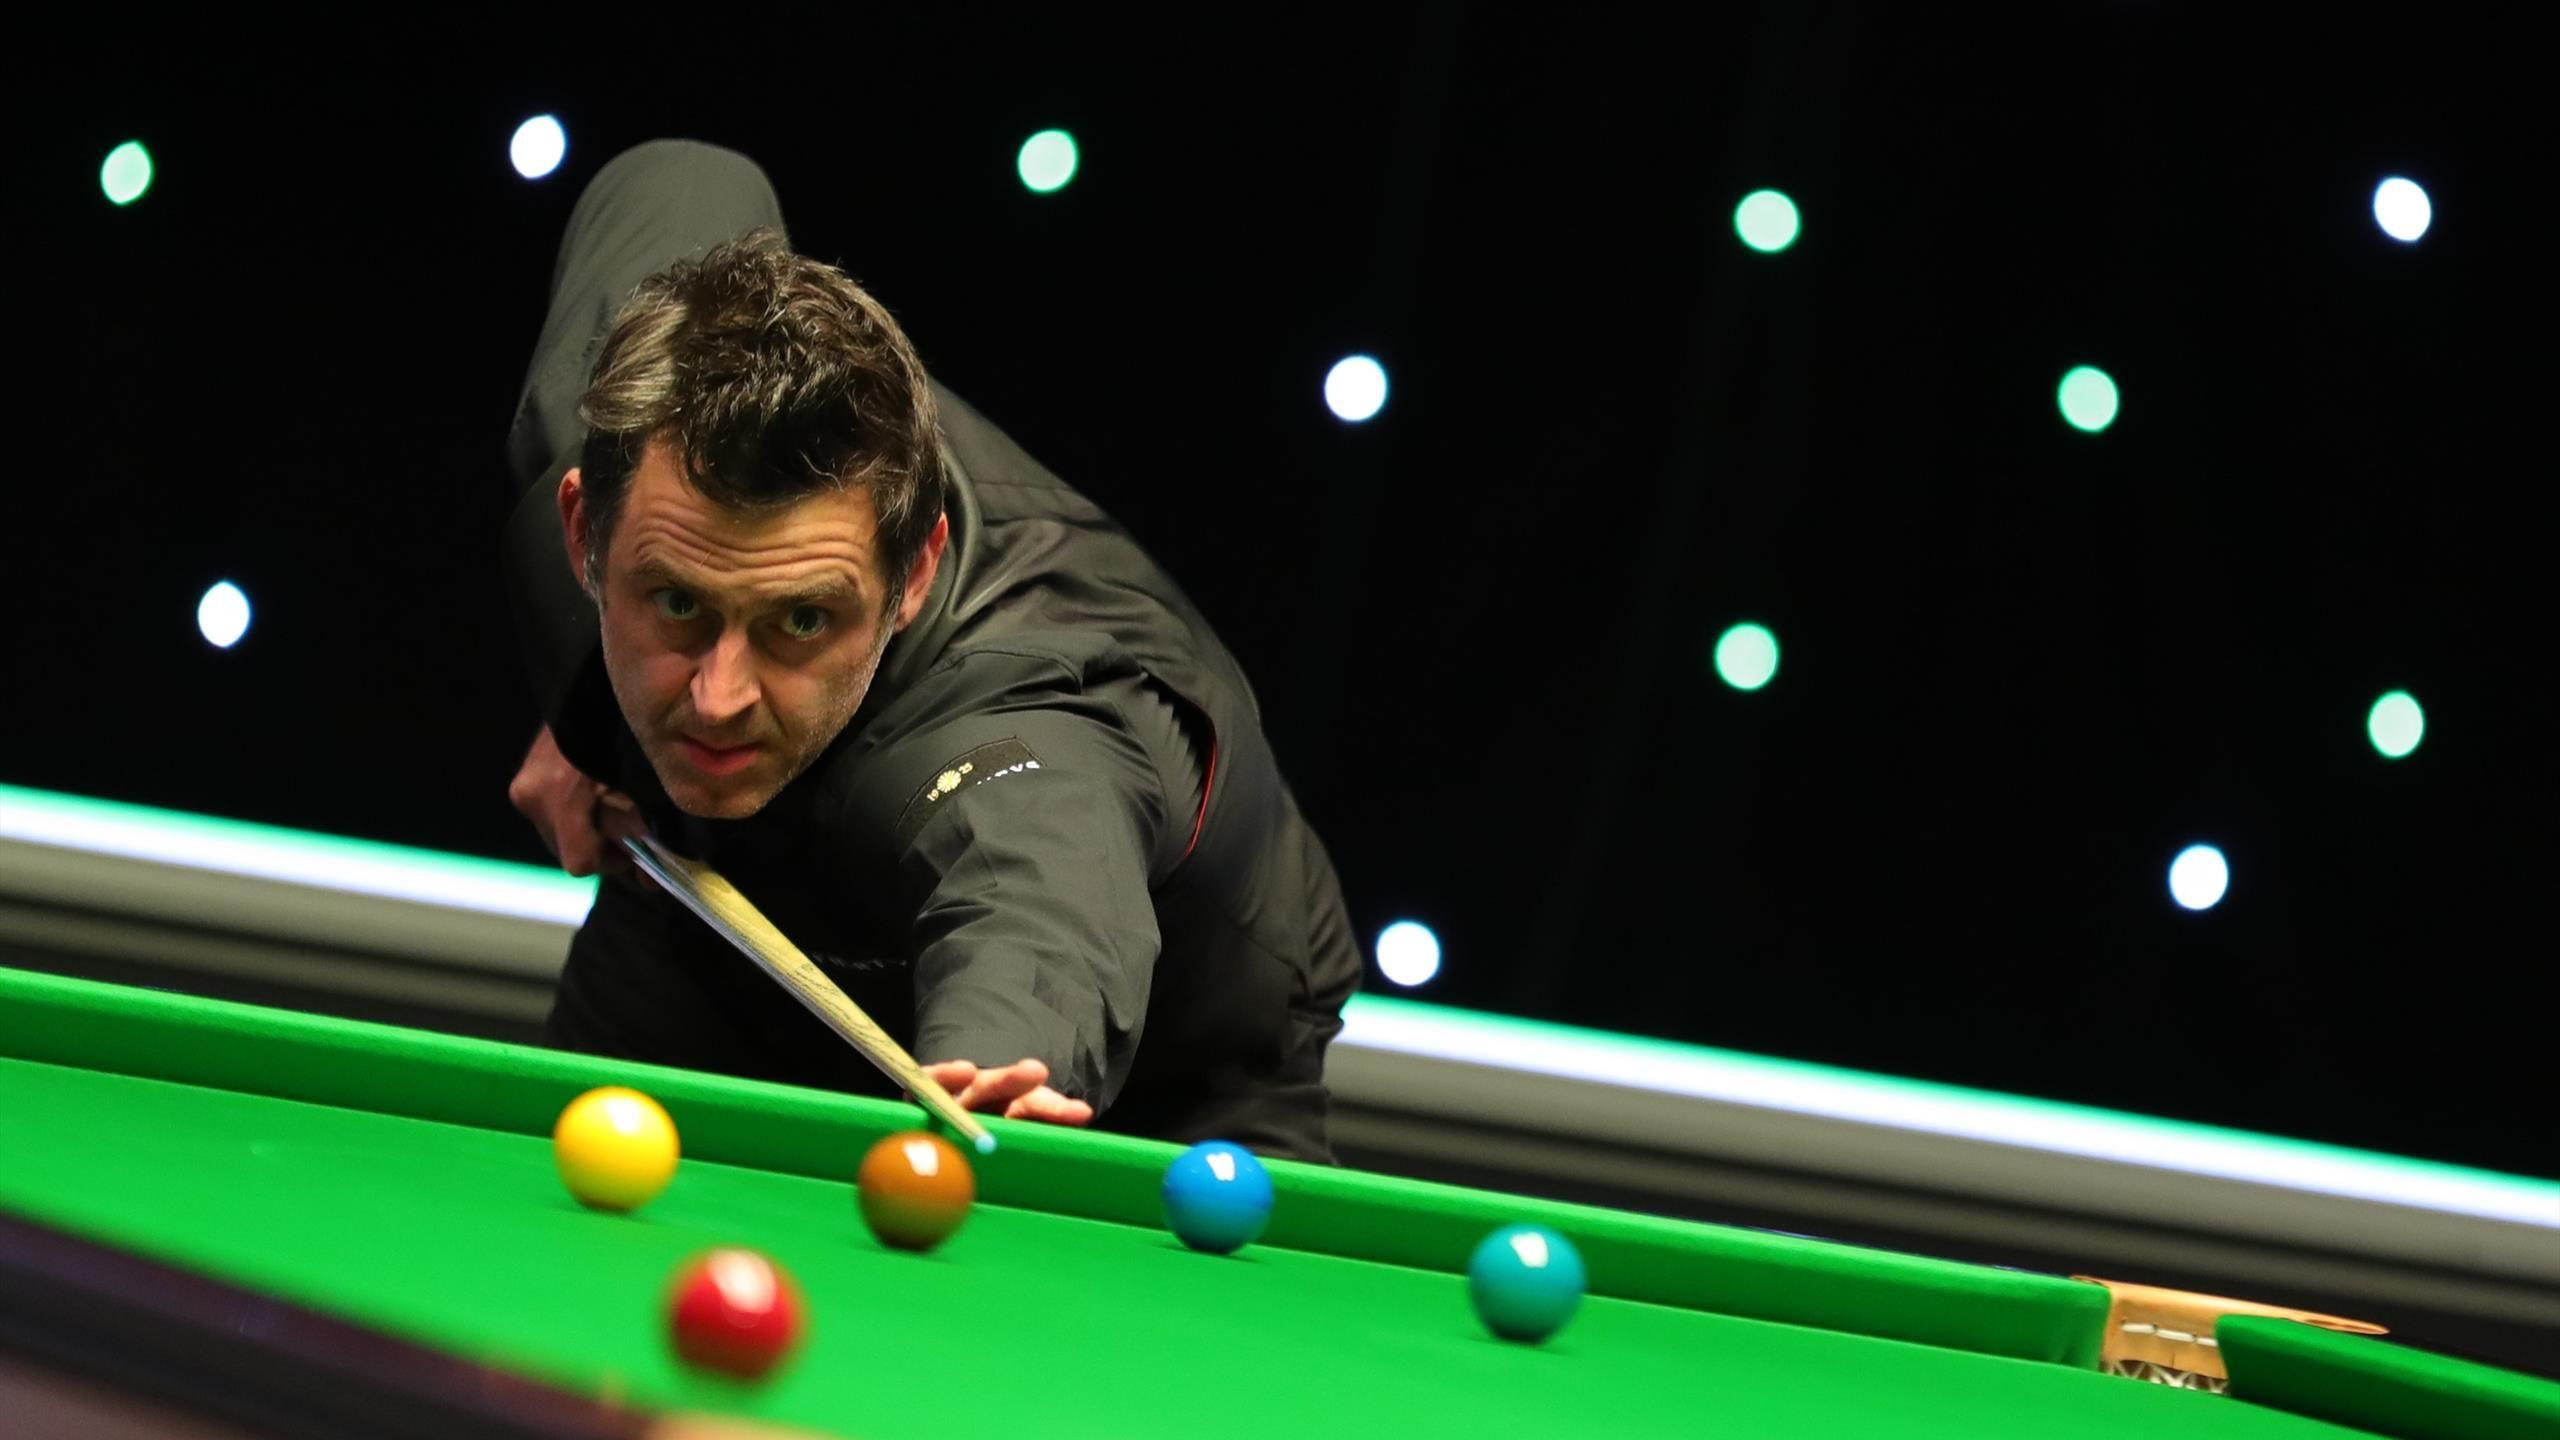 World seniors snooker betting system dennis rodman irish betting site